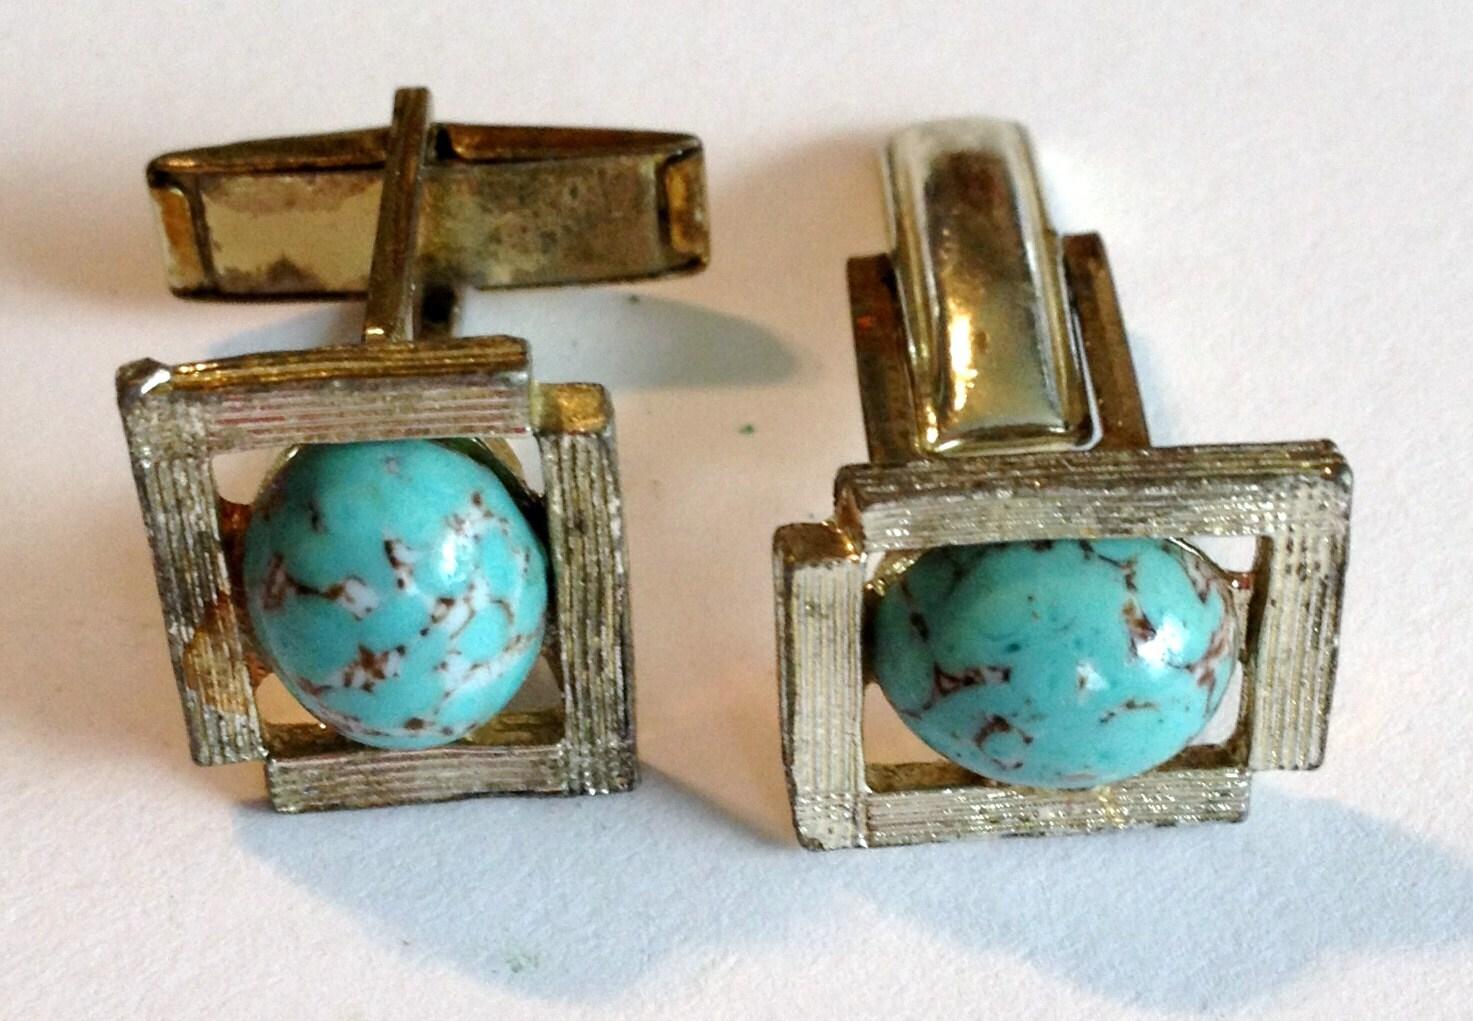 Vintage Turquois Robin Egg Cufflinks FREE SHIPPING - ArtByBurton